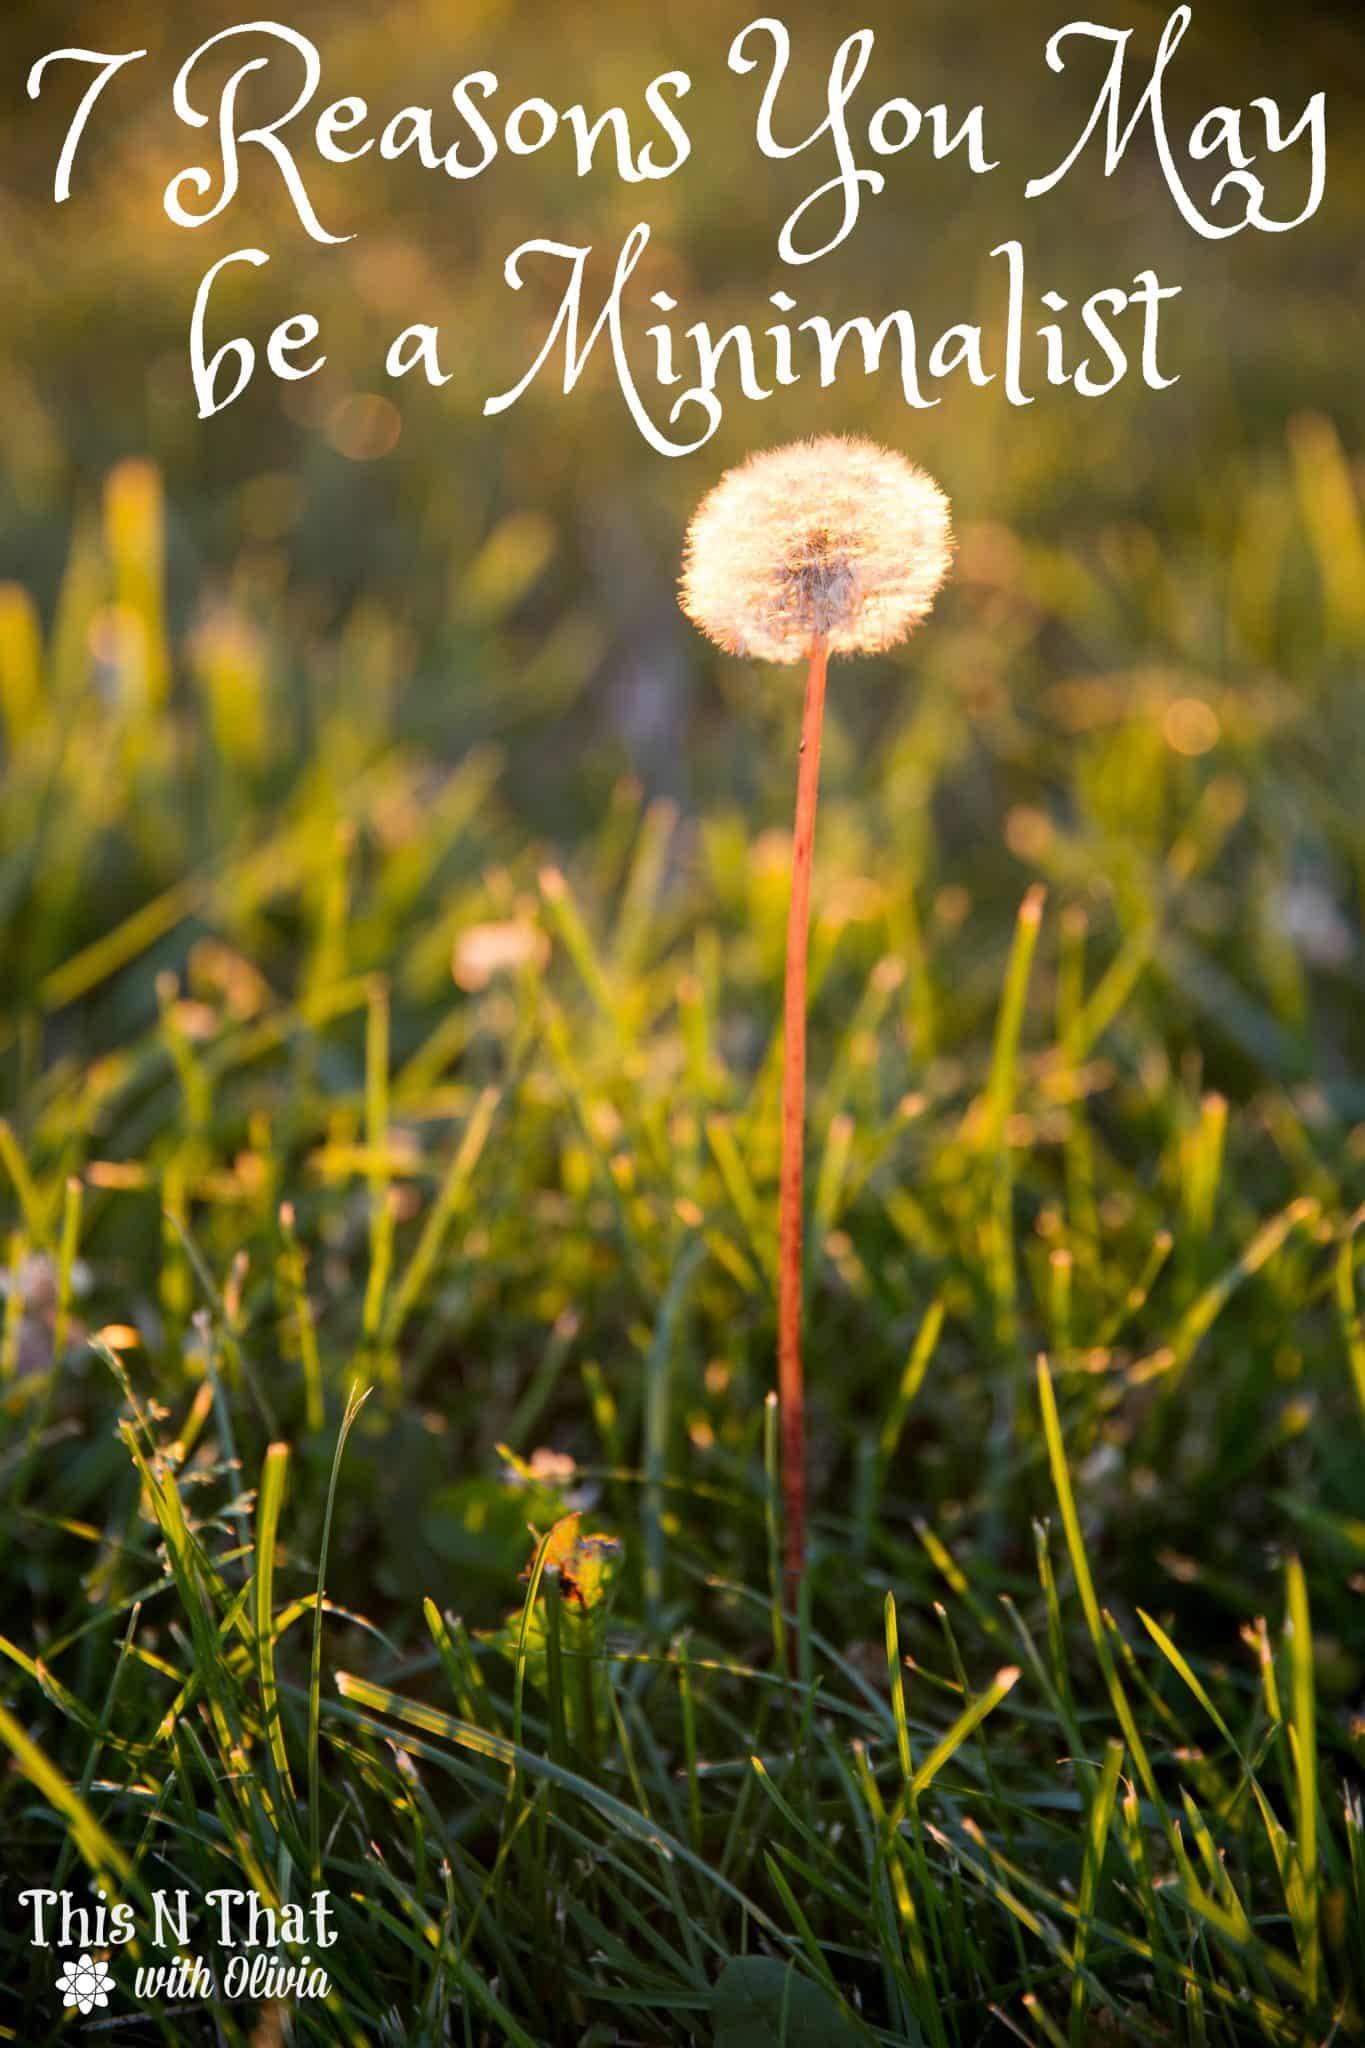 7 Reasons You May be a Minimalist